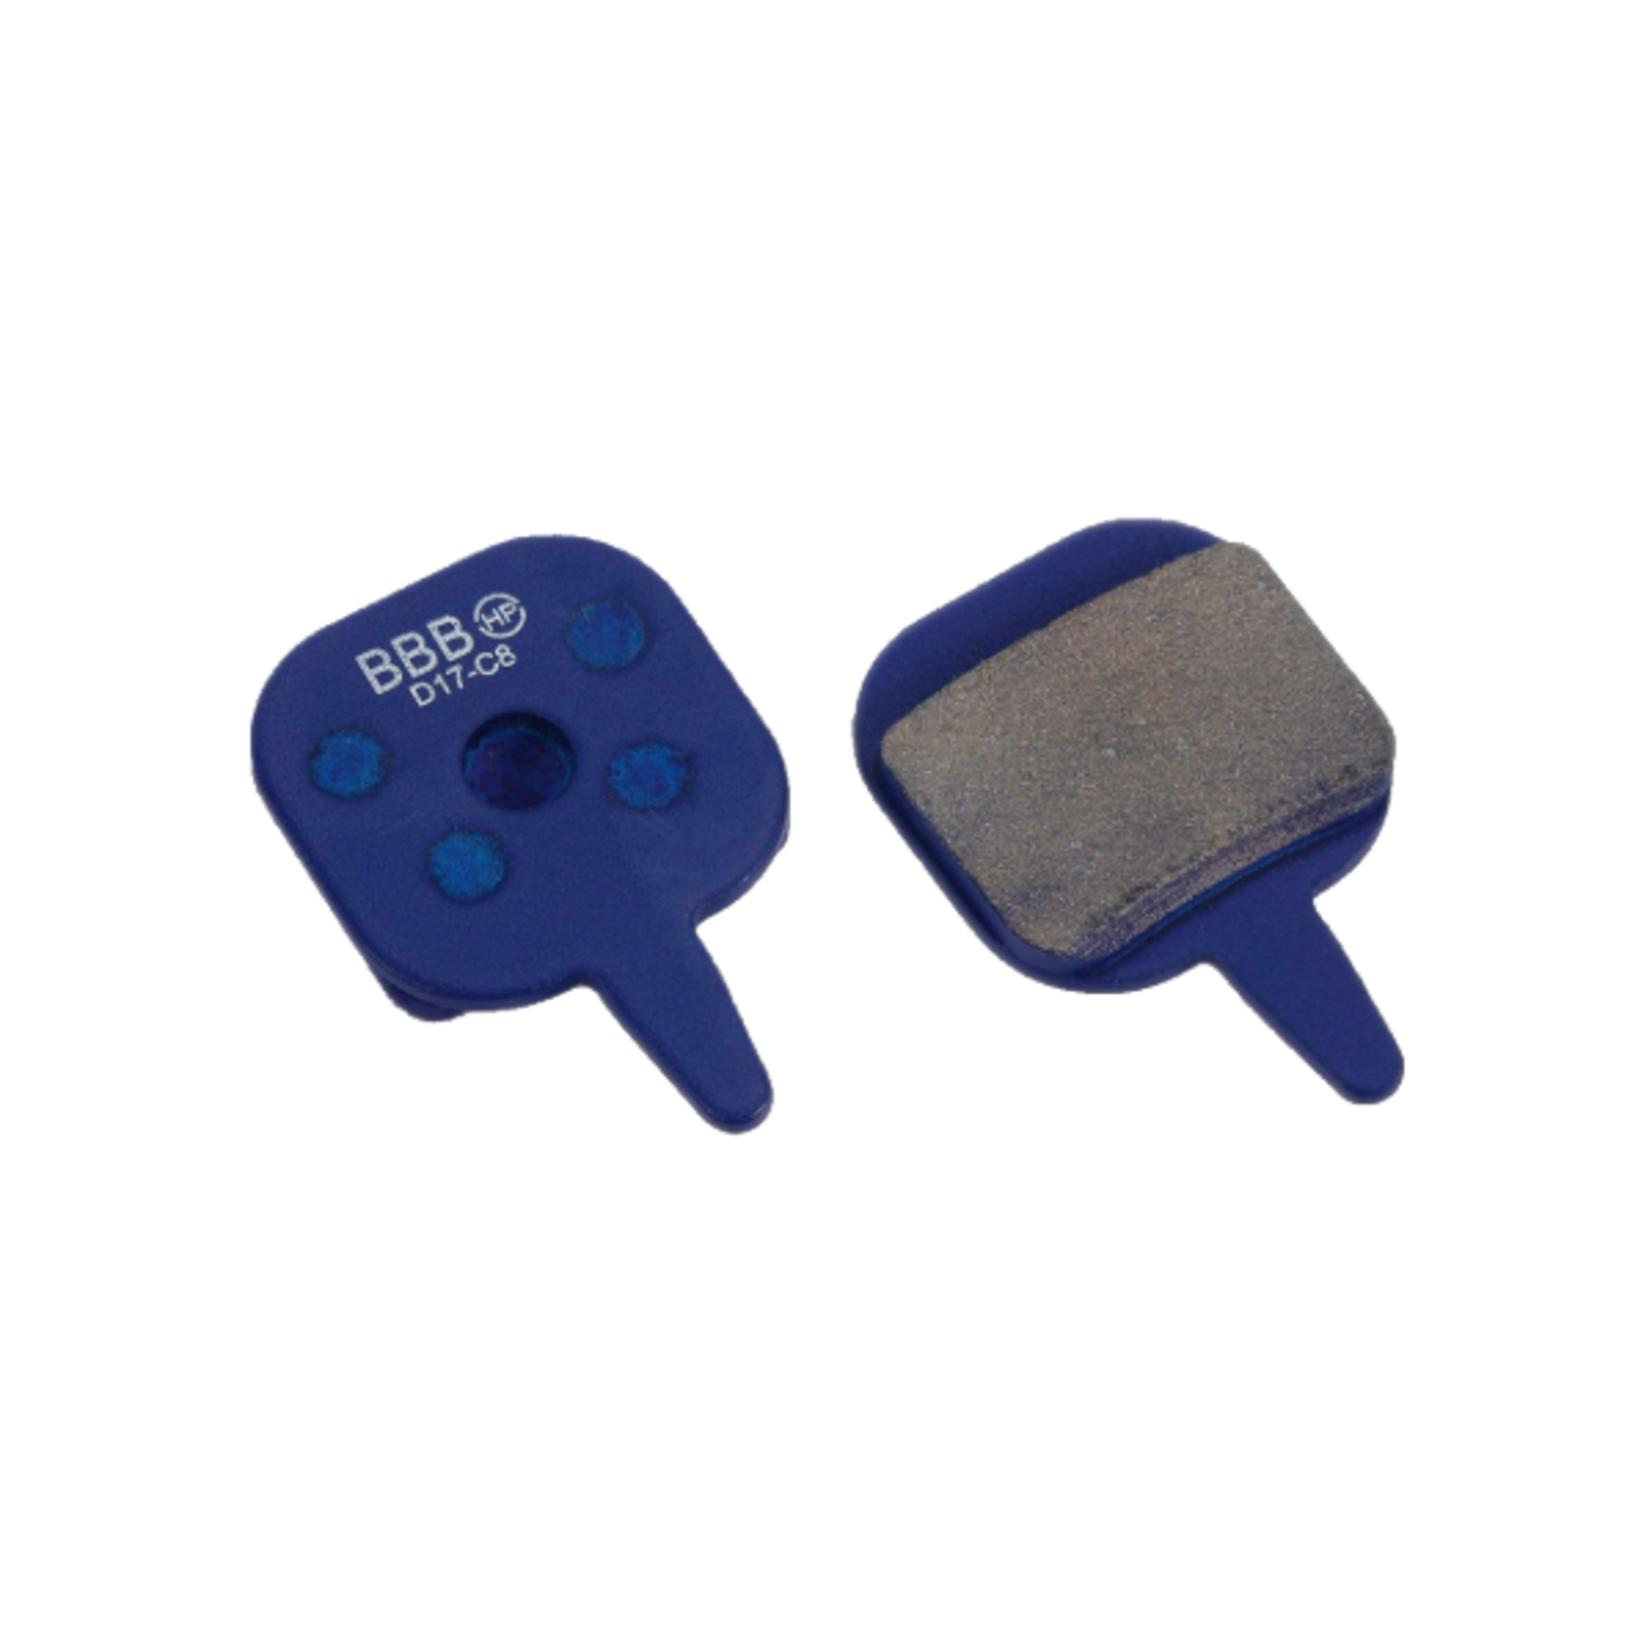 BBB BBB, Disc Stop Disc Brake Pads, Compatible Tektro Novela, IO